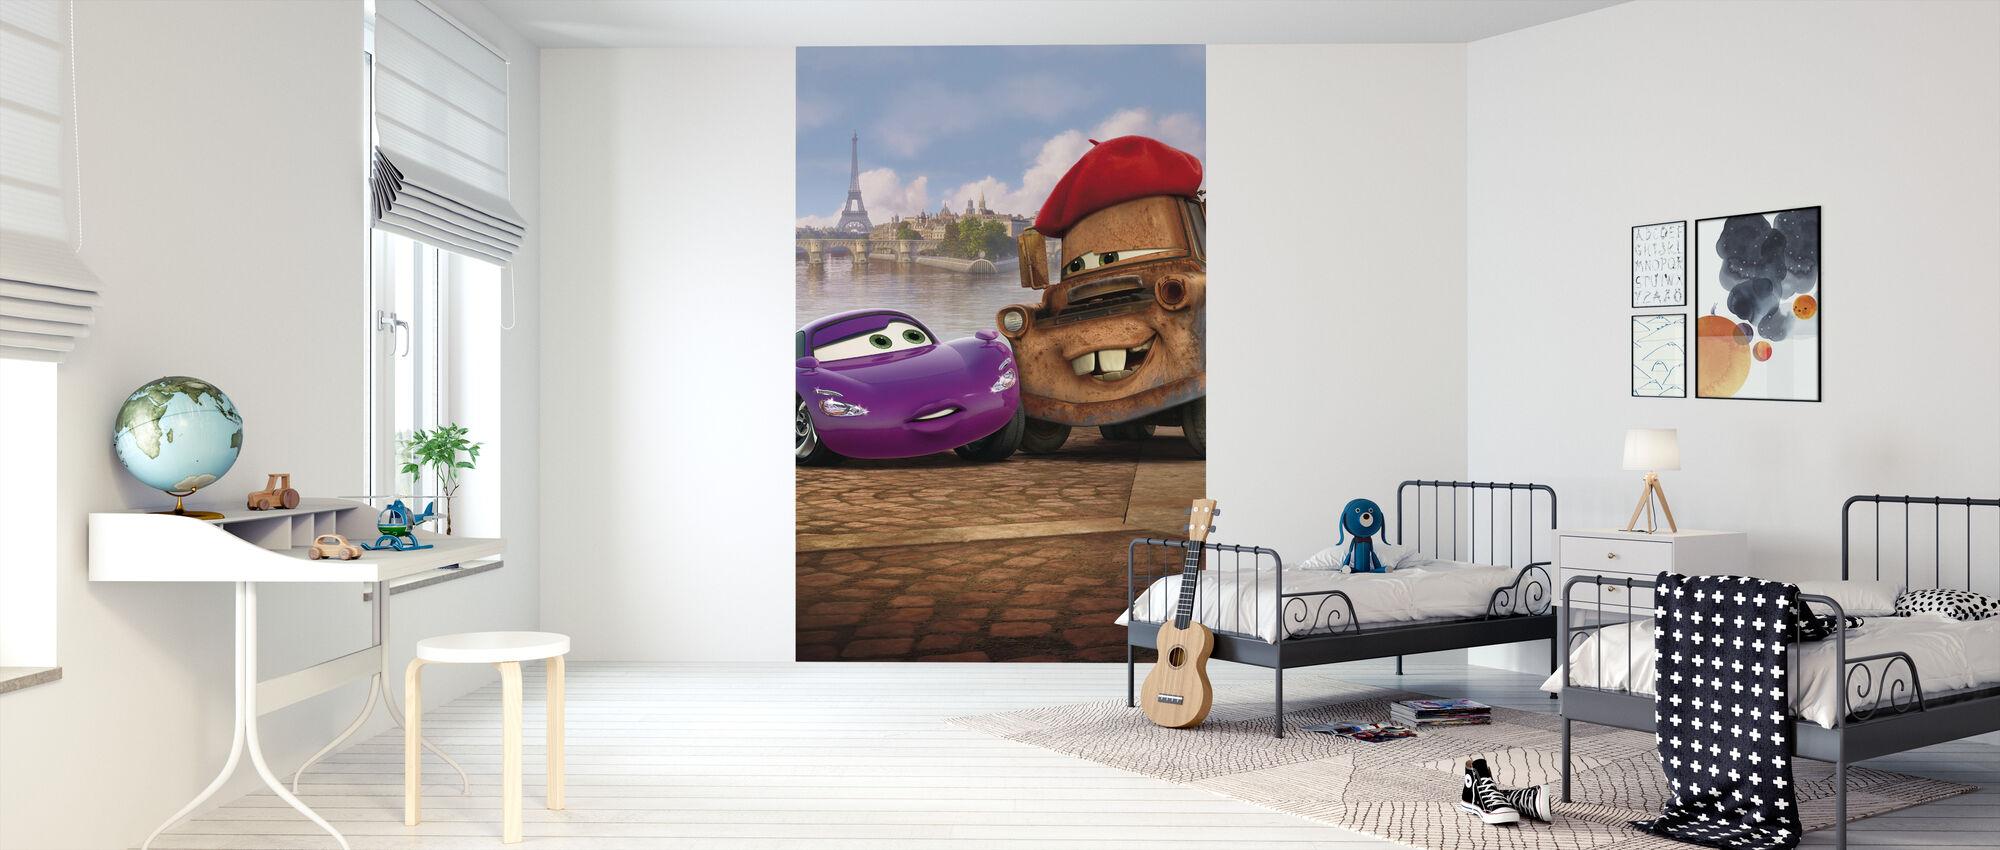 Autot 2 - Mater Holley Shiftwell - Pariisi - Tapetti - Lastenhuone